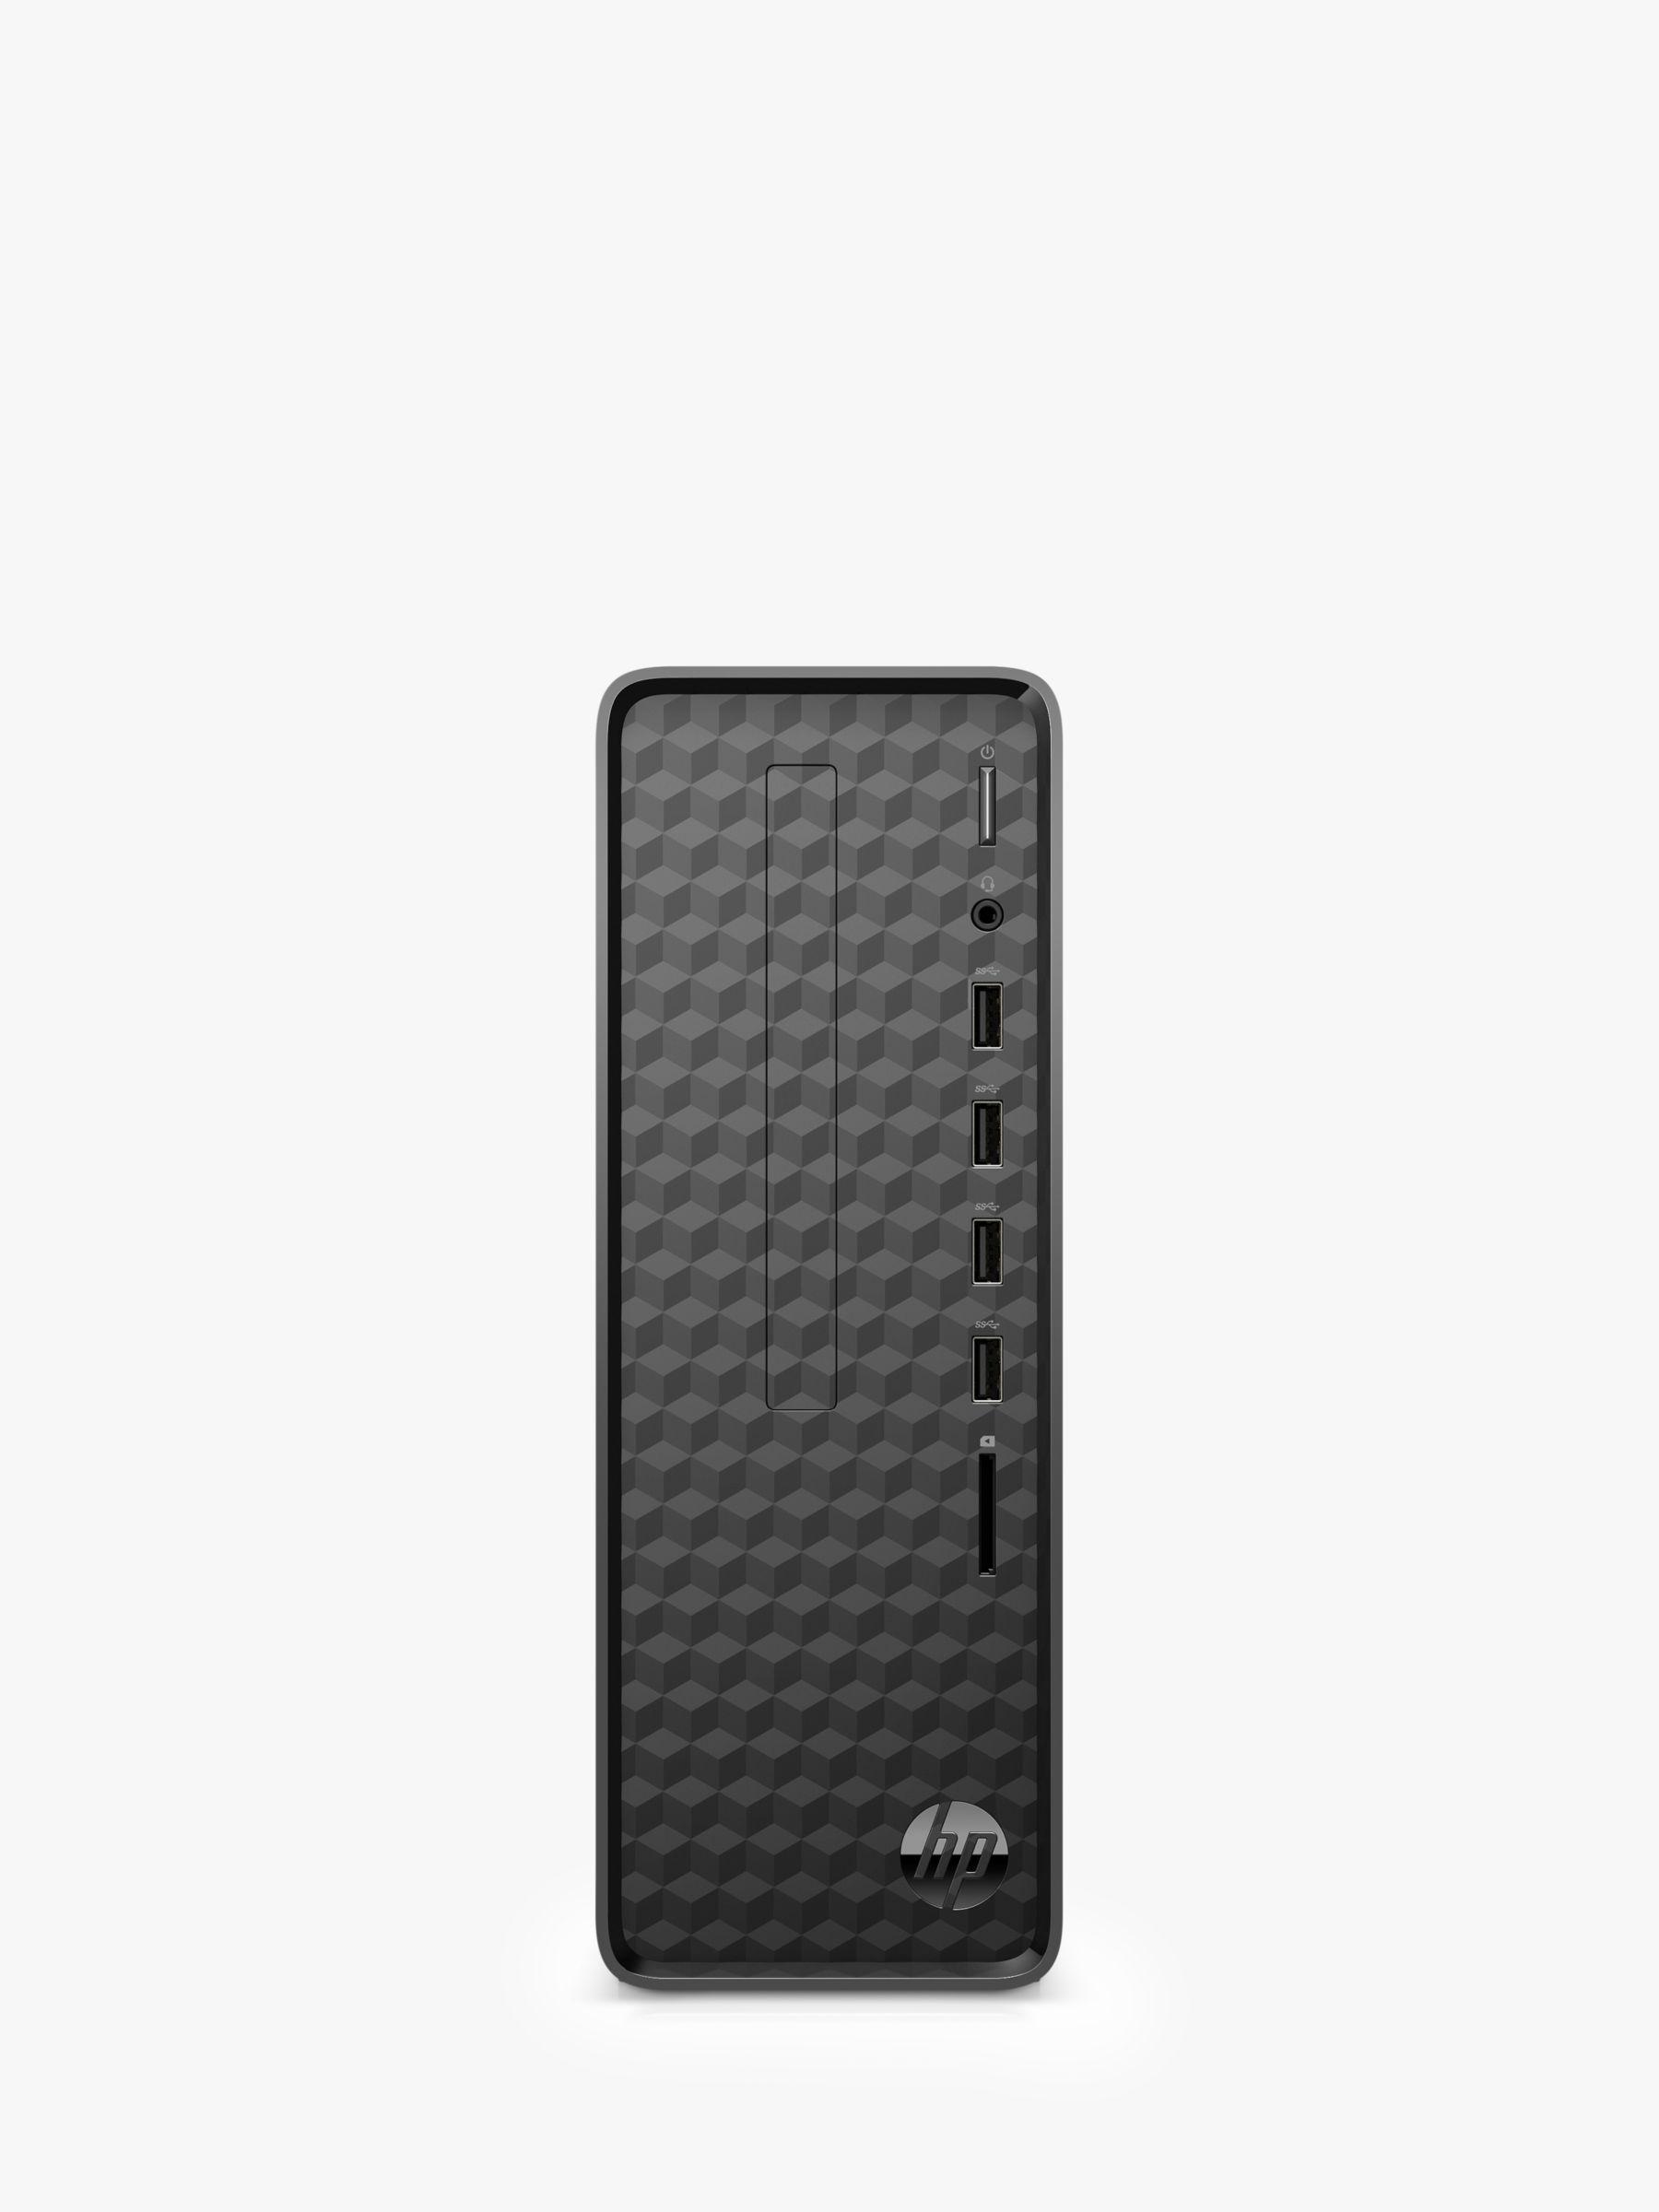 HP Slim S01-aF1000na Desktop PC, Intel Celeron Processor, 4GB RAM, 1TB HDD